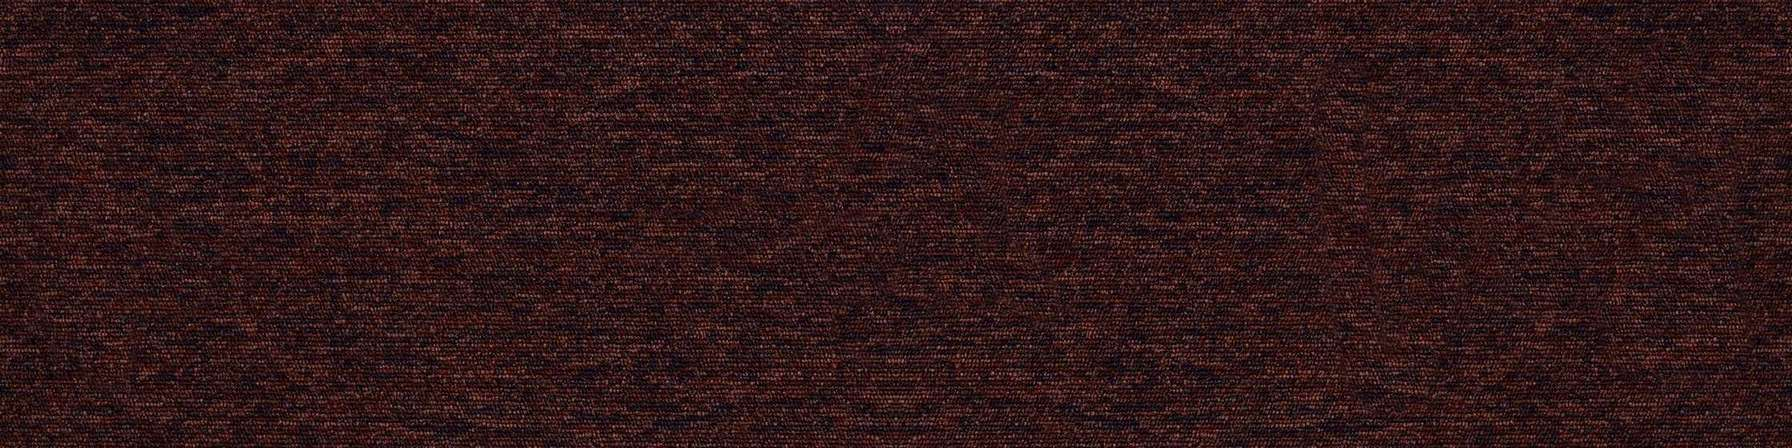 tivoli 21149 martinique maroon carpet plank